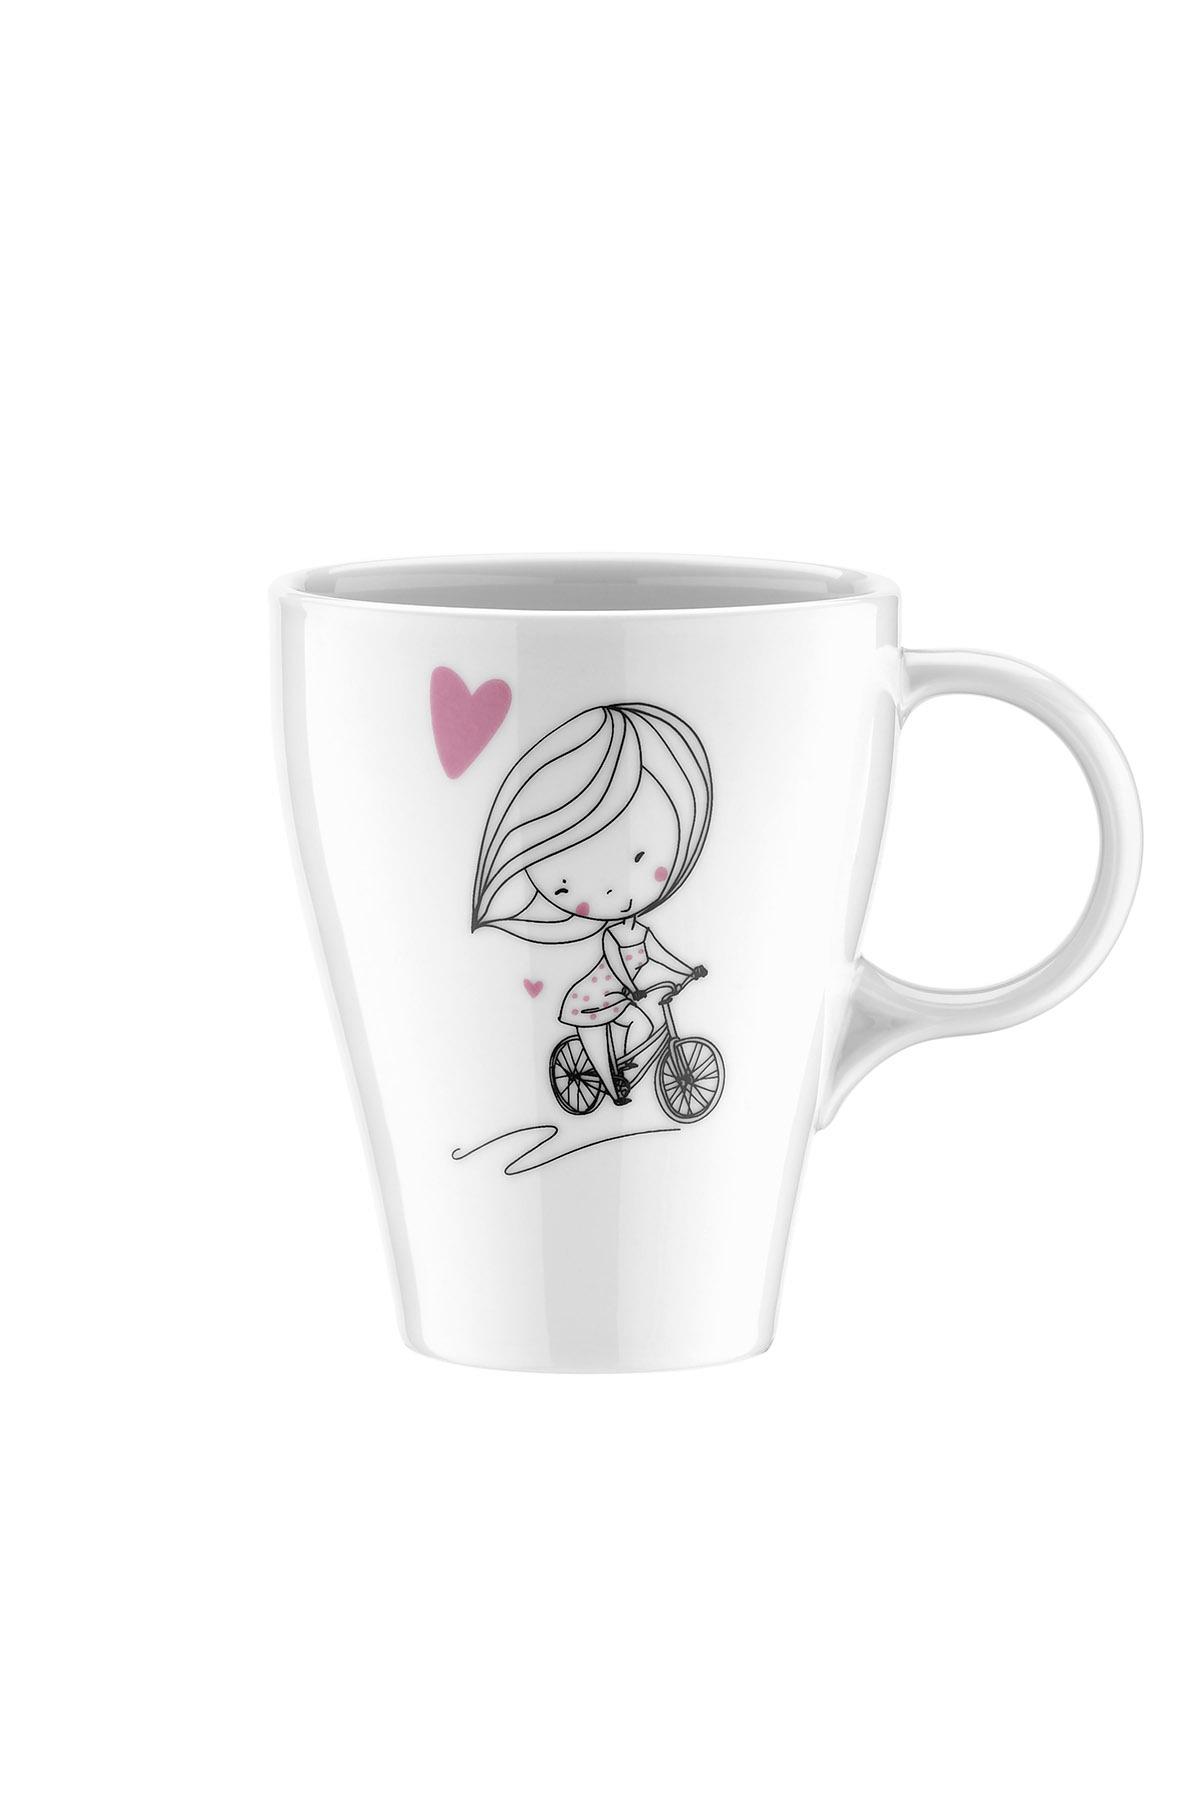 Kütahya Porselen - Kütahya Porselen 10156 Desen 2li Mug Bardak